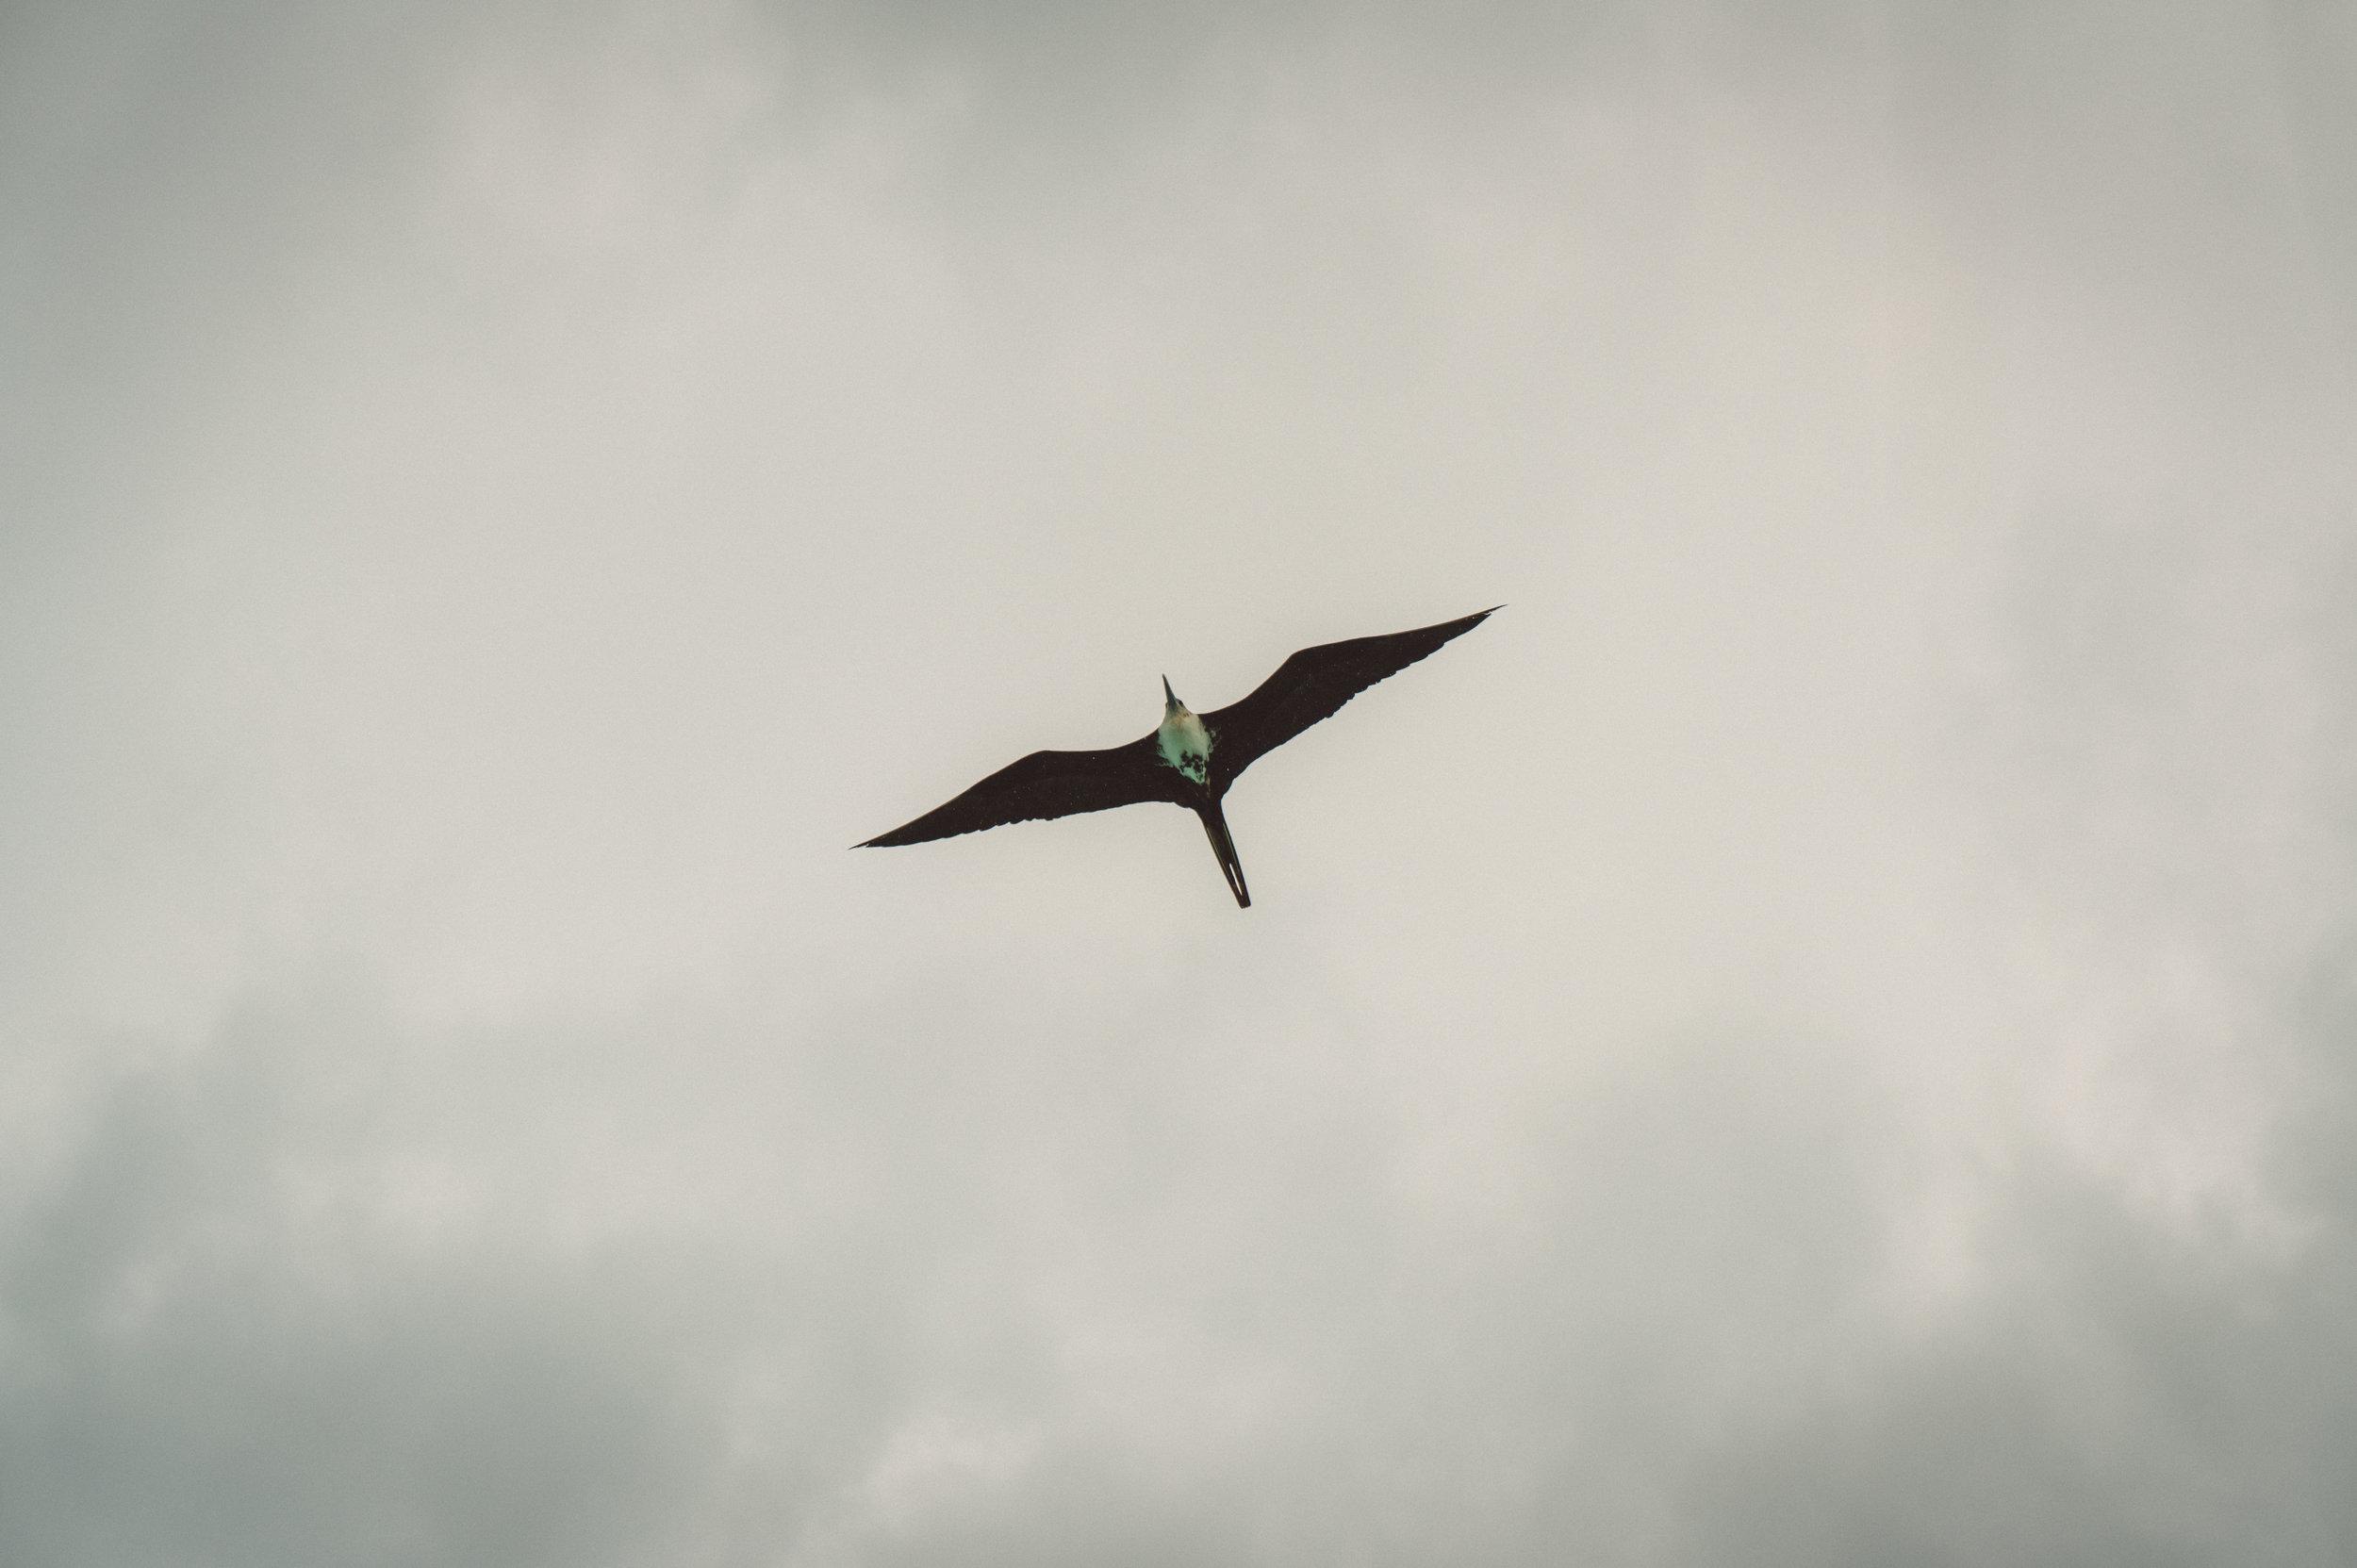 A frigatebird flying above Sarteneja's pier.